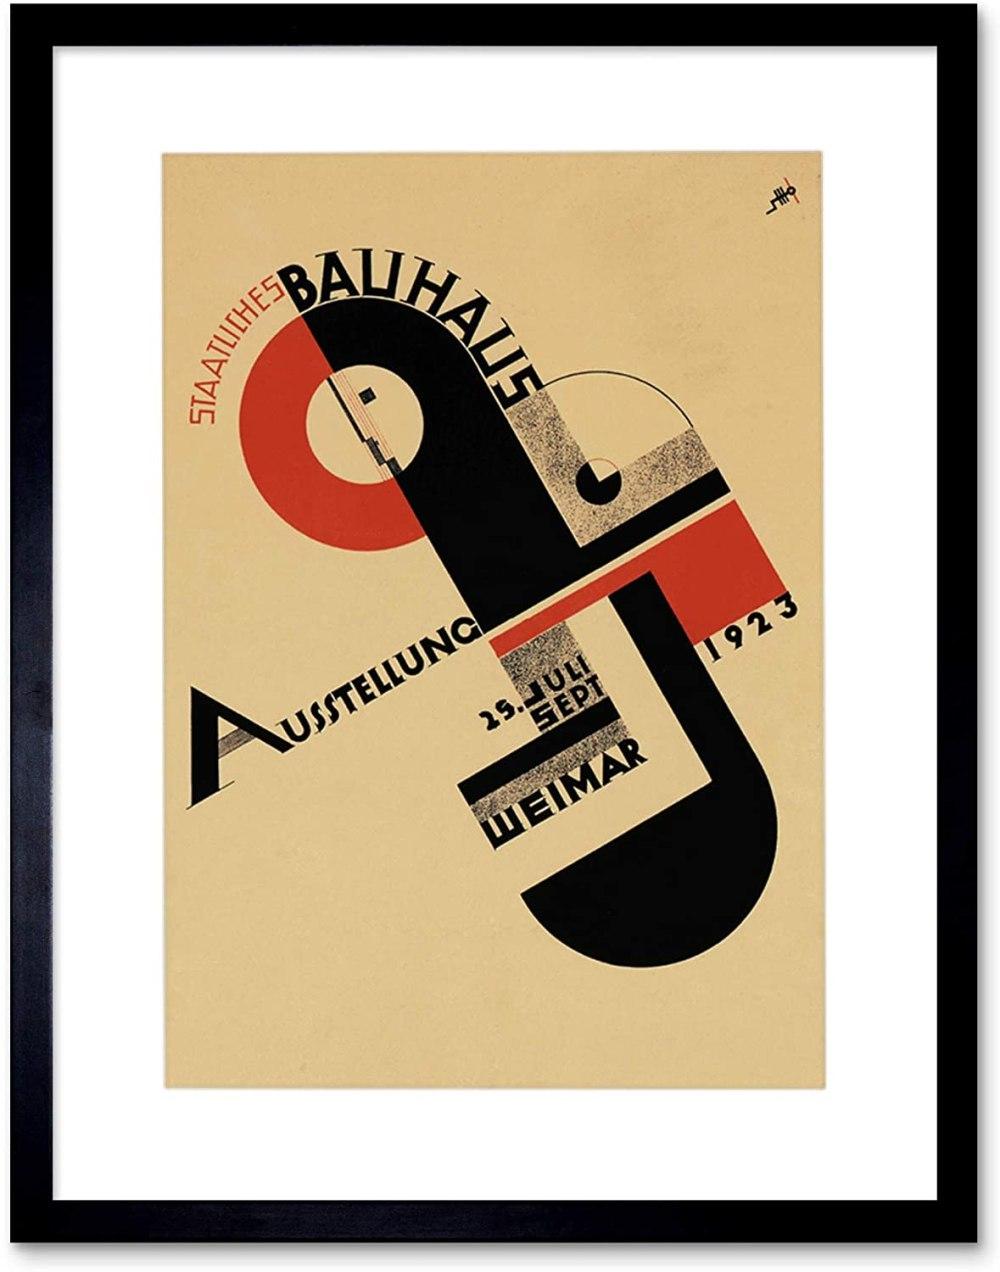 Bauhaus Weimar ICON Vintage AD Frame Art Print Picture